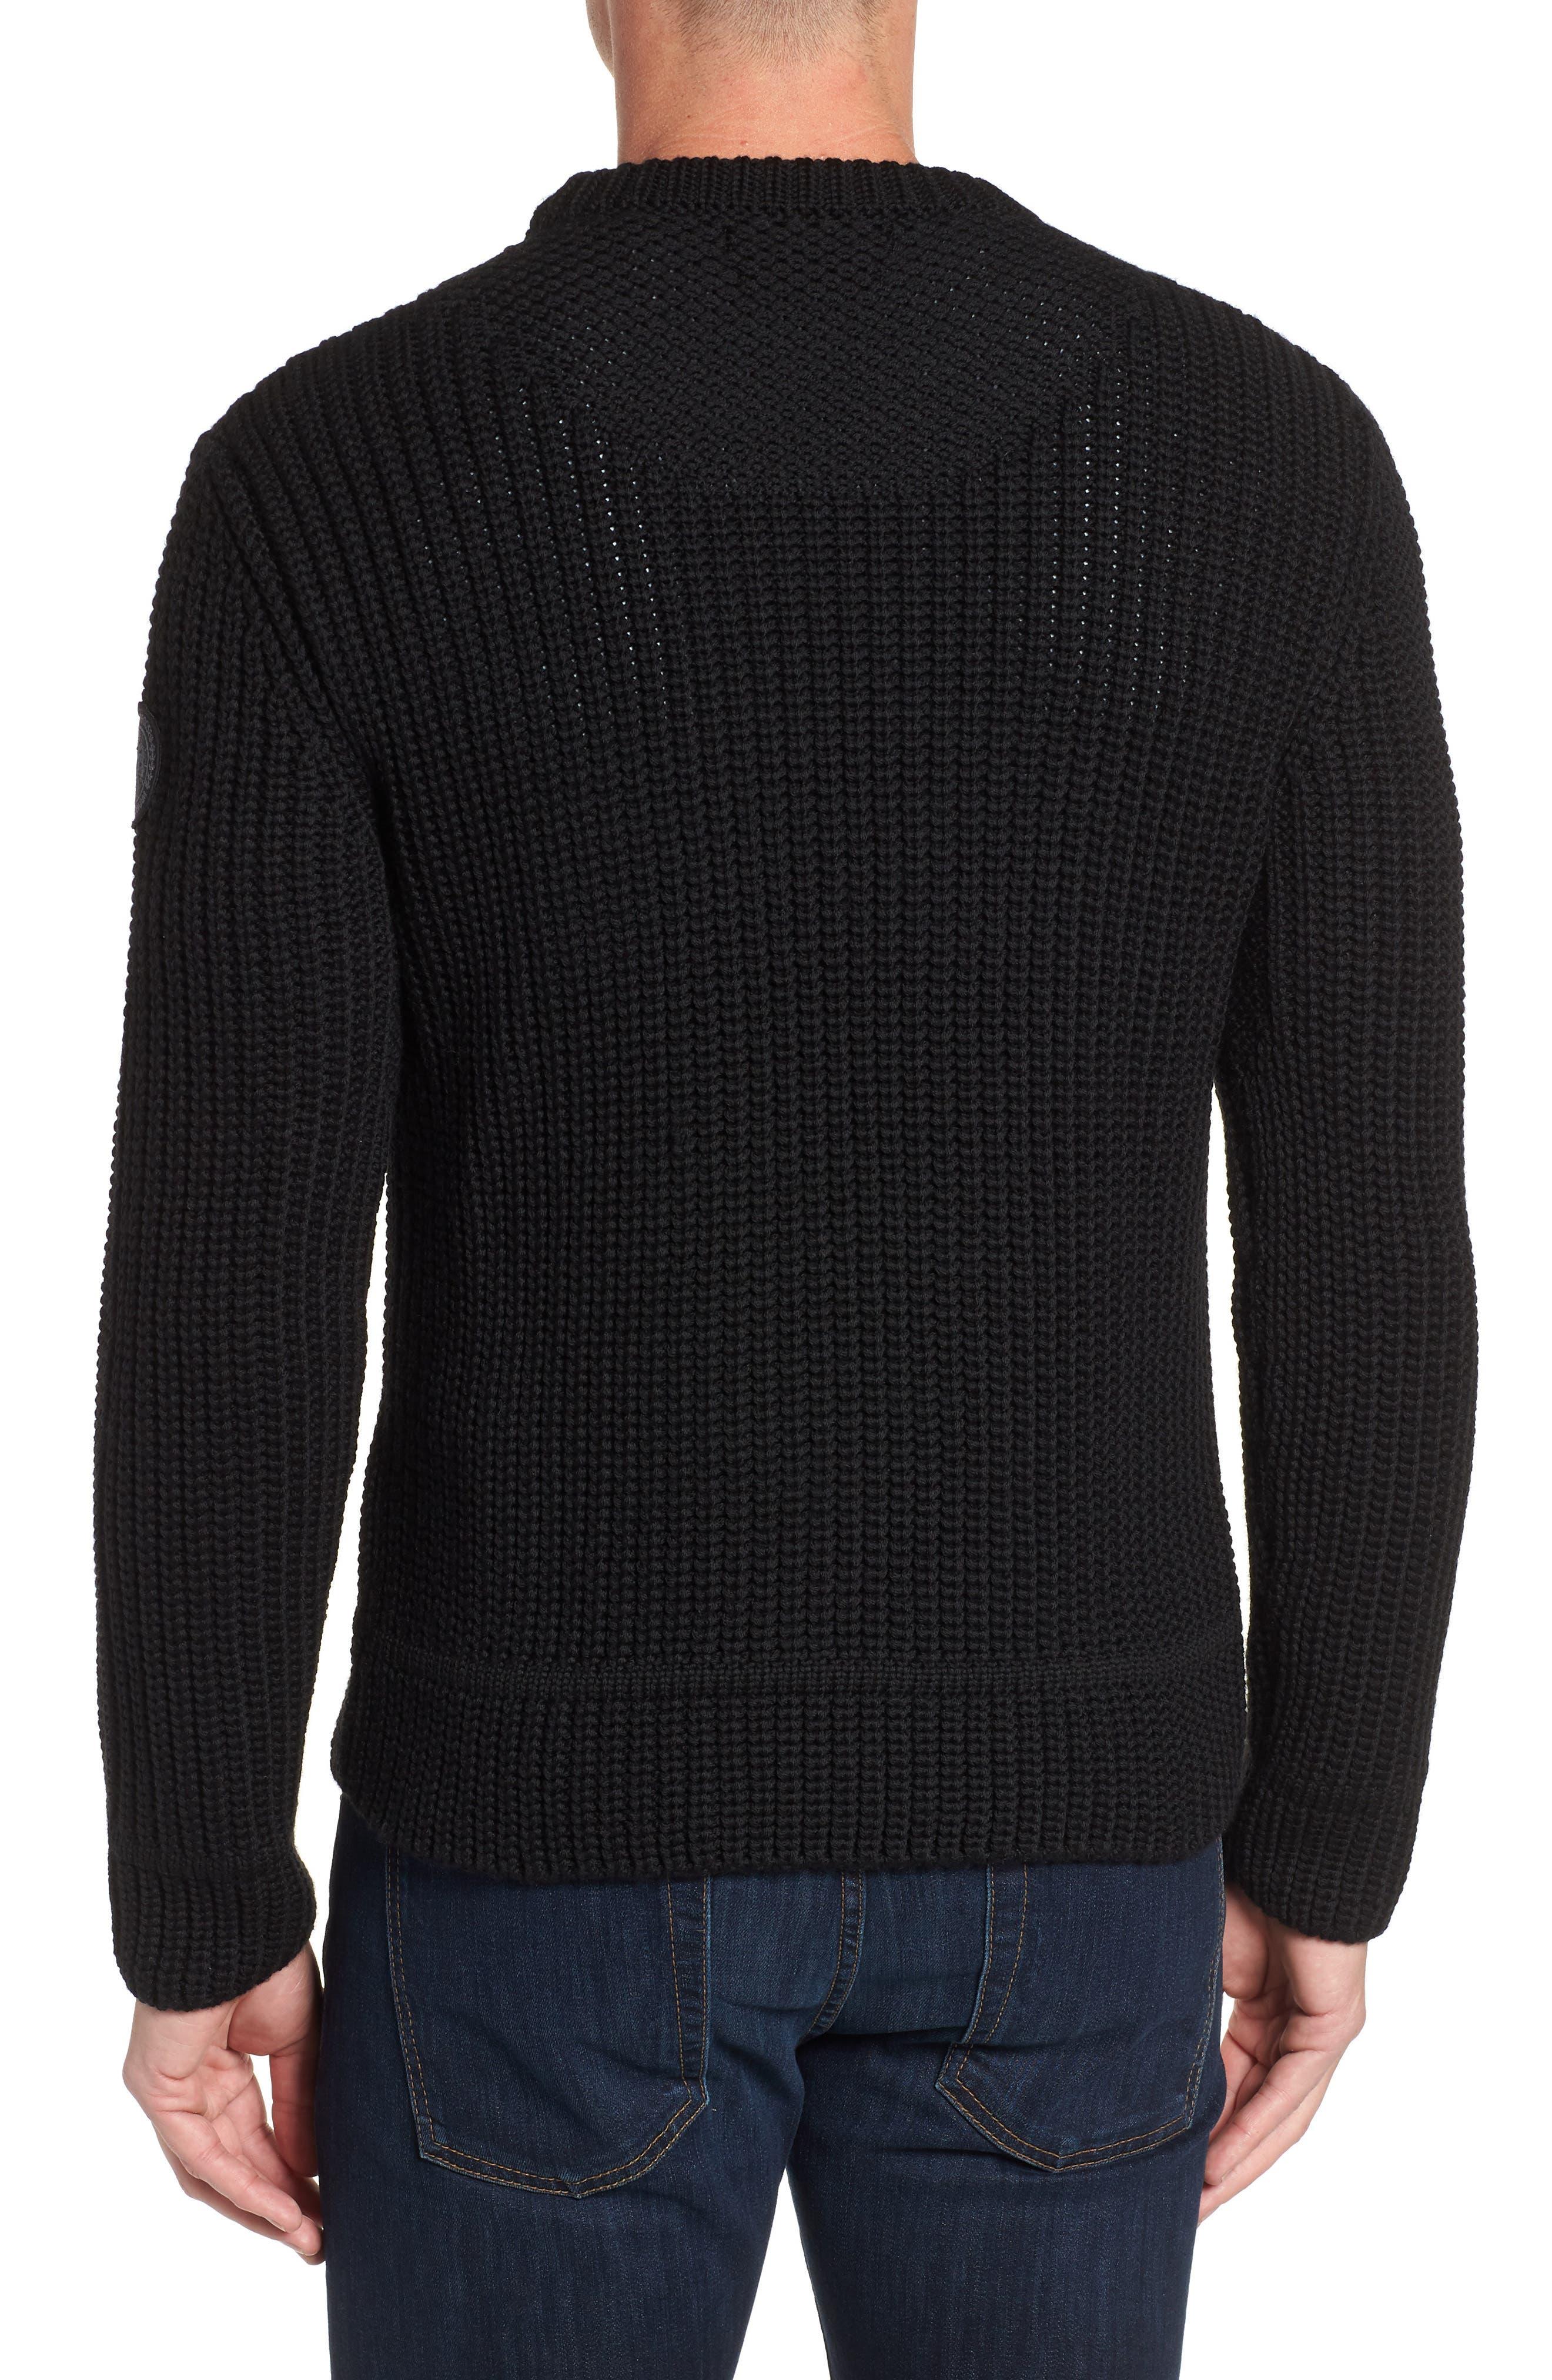 Galloway Regular Fit Merino Wool Sweater,                             Alternate thumbnail 2, color,                             BLACK